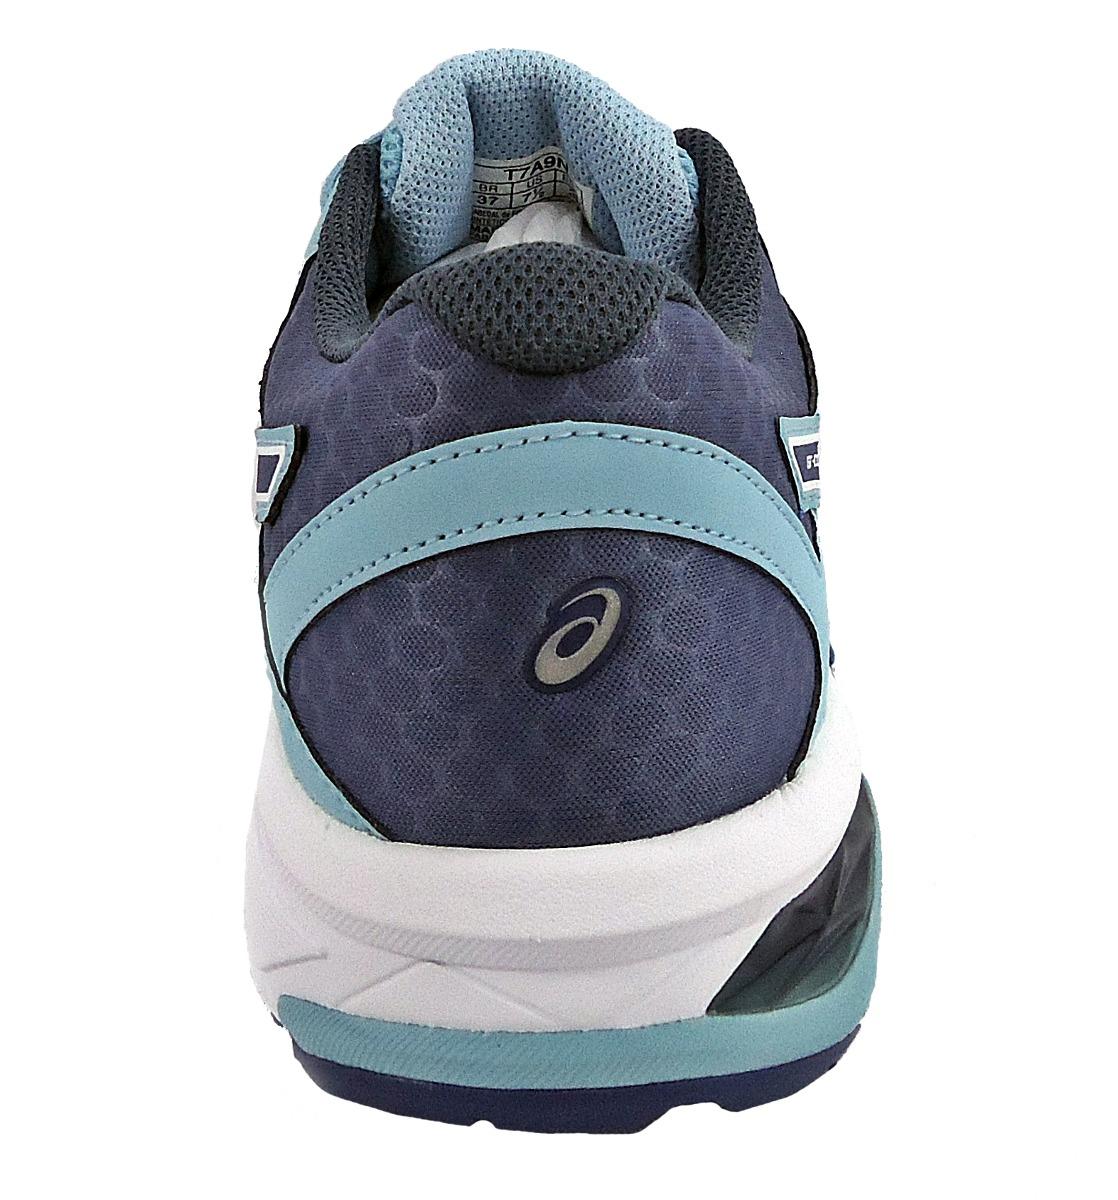 tenis asics gel gt-1000 6 feminino azul - pronta entrega. Carregando zoom. 81100e05d406c